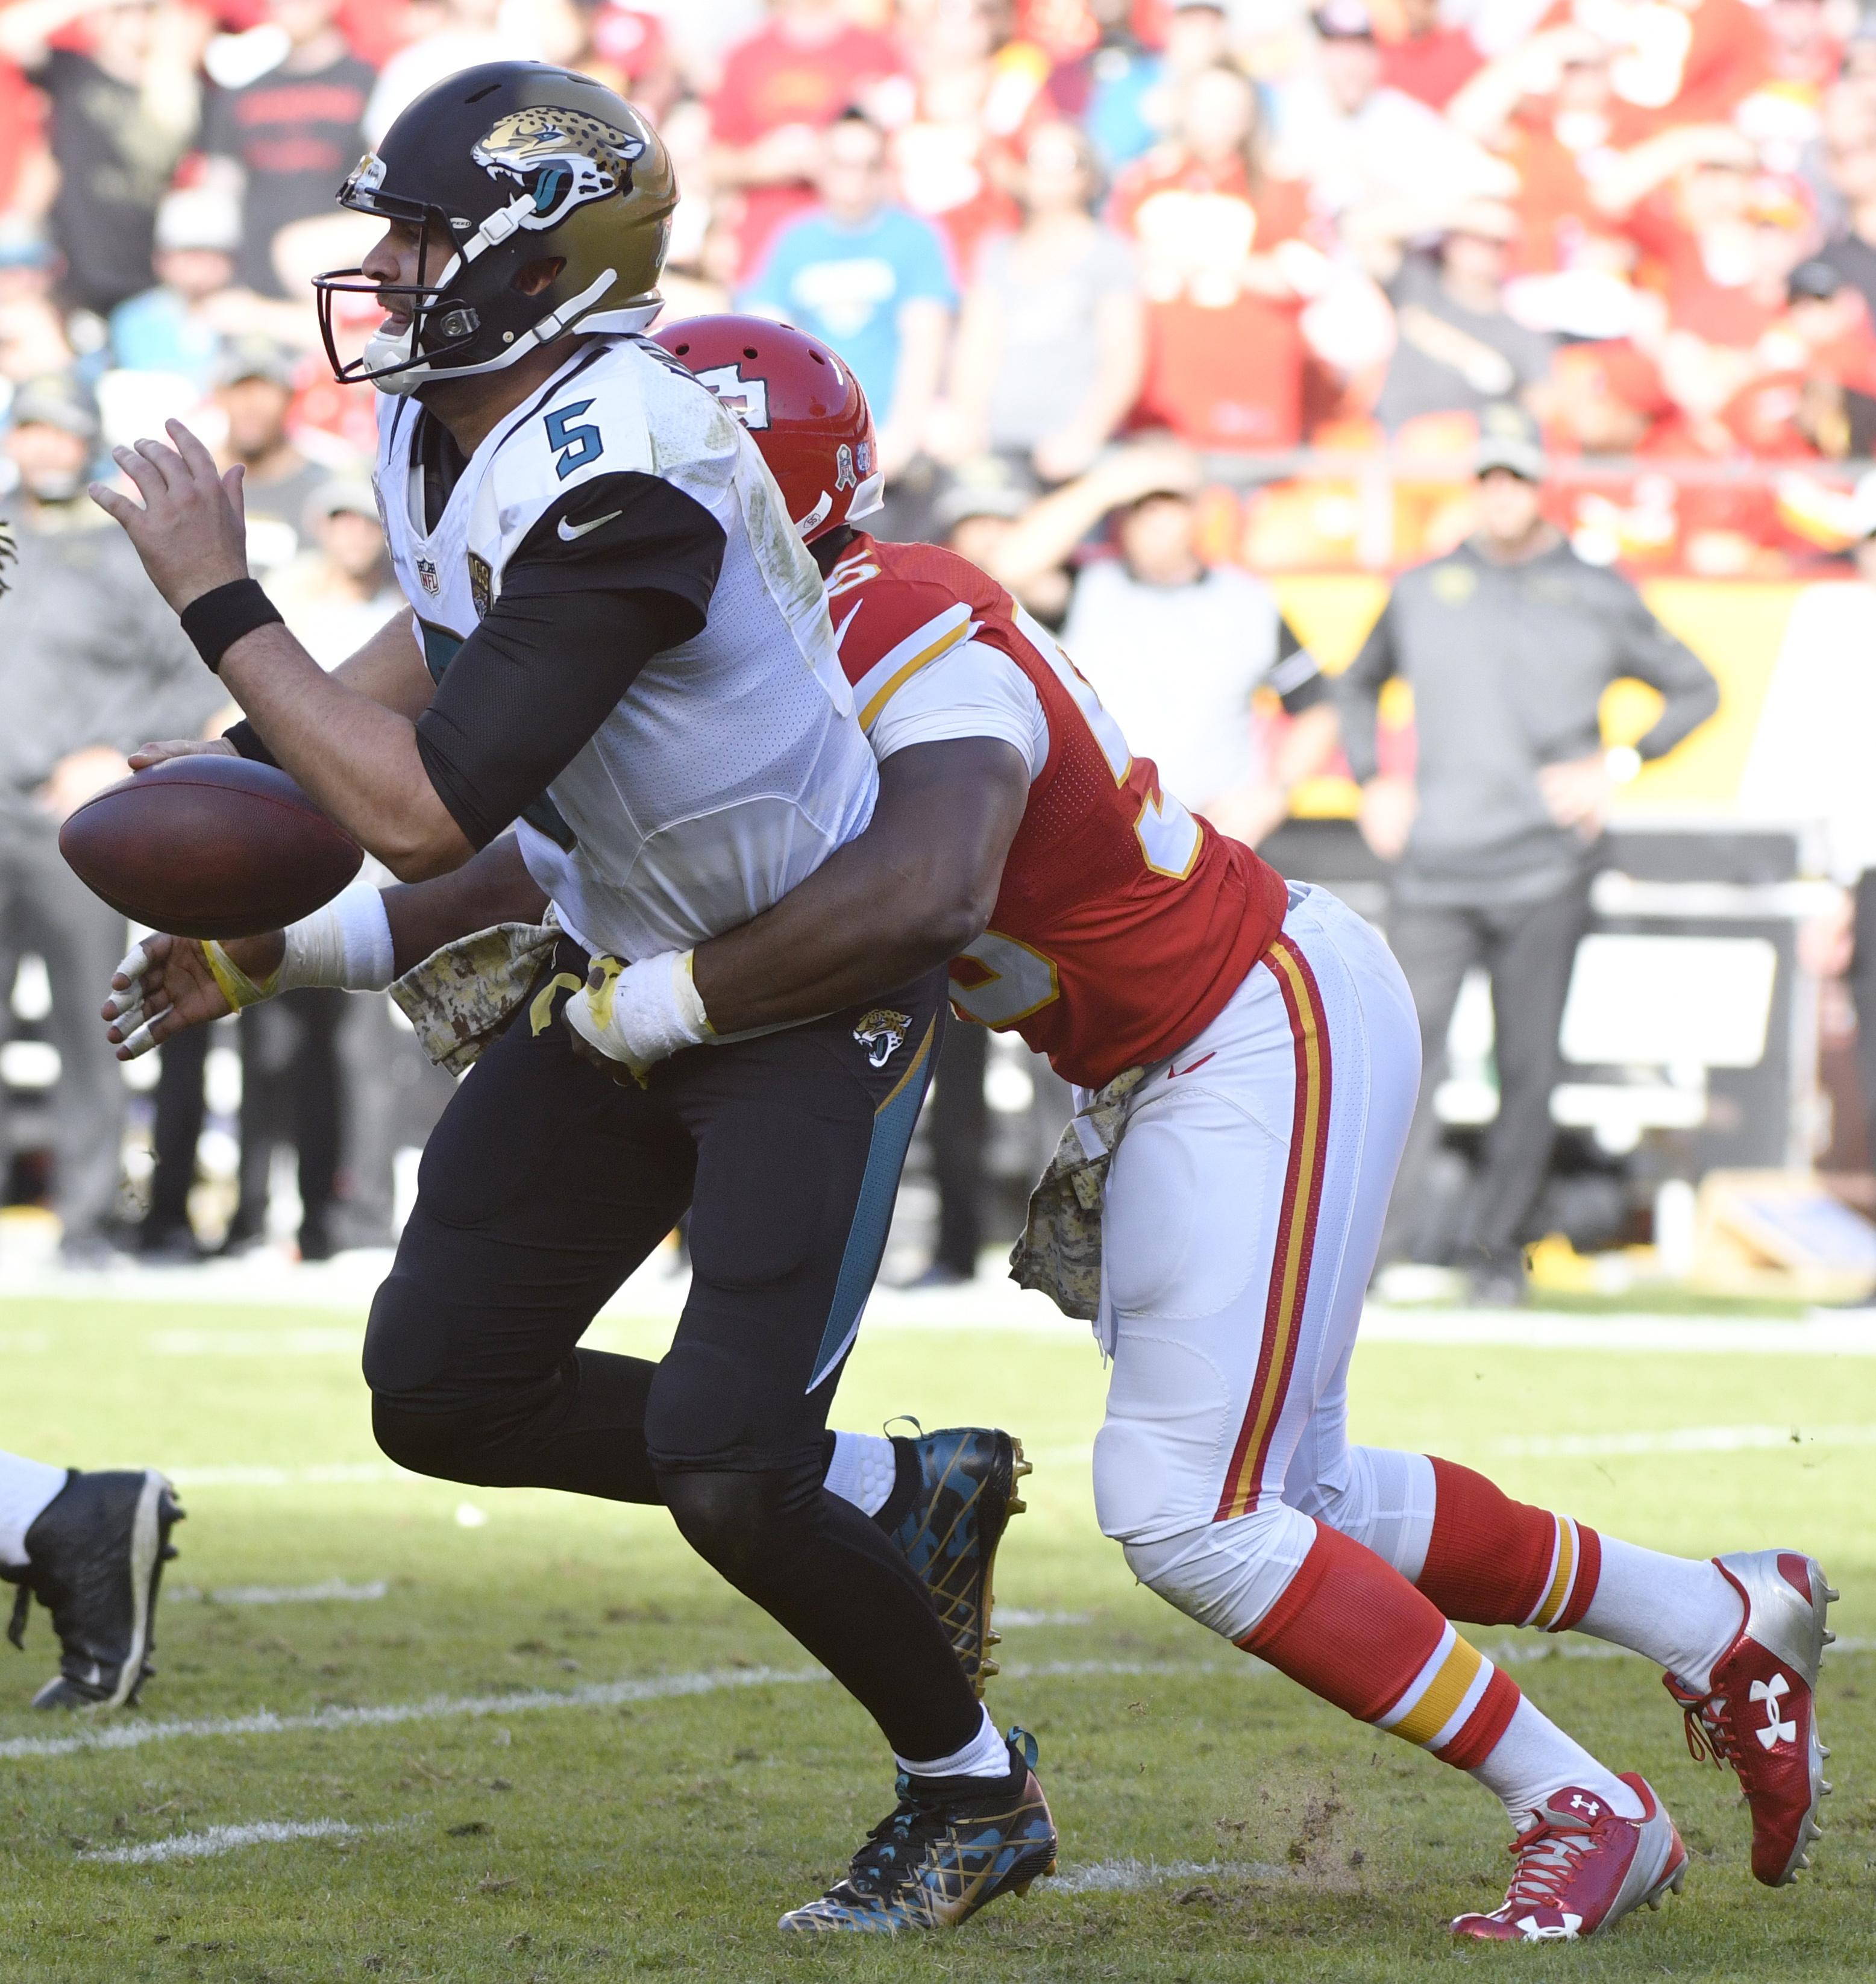 Kansas City Chiefs linebacker Dee Ford (55) sacks Jacksonville Jaguars quarterback Blake Bortles (5) during the second half of an NFL football game in Kansas City, Mo., Sunday, Nov. 6, 2016. (AP Photo/Ed Zurga)